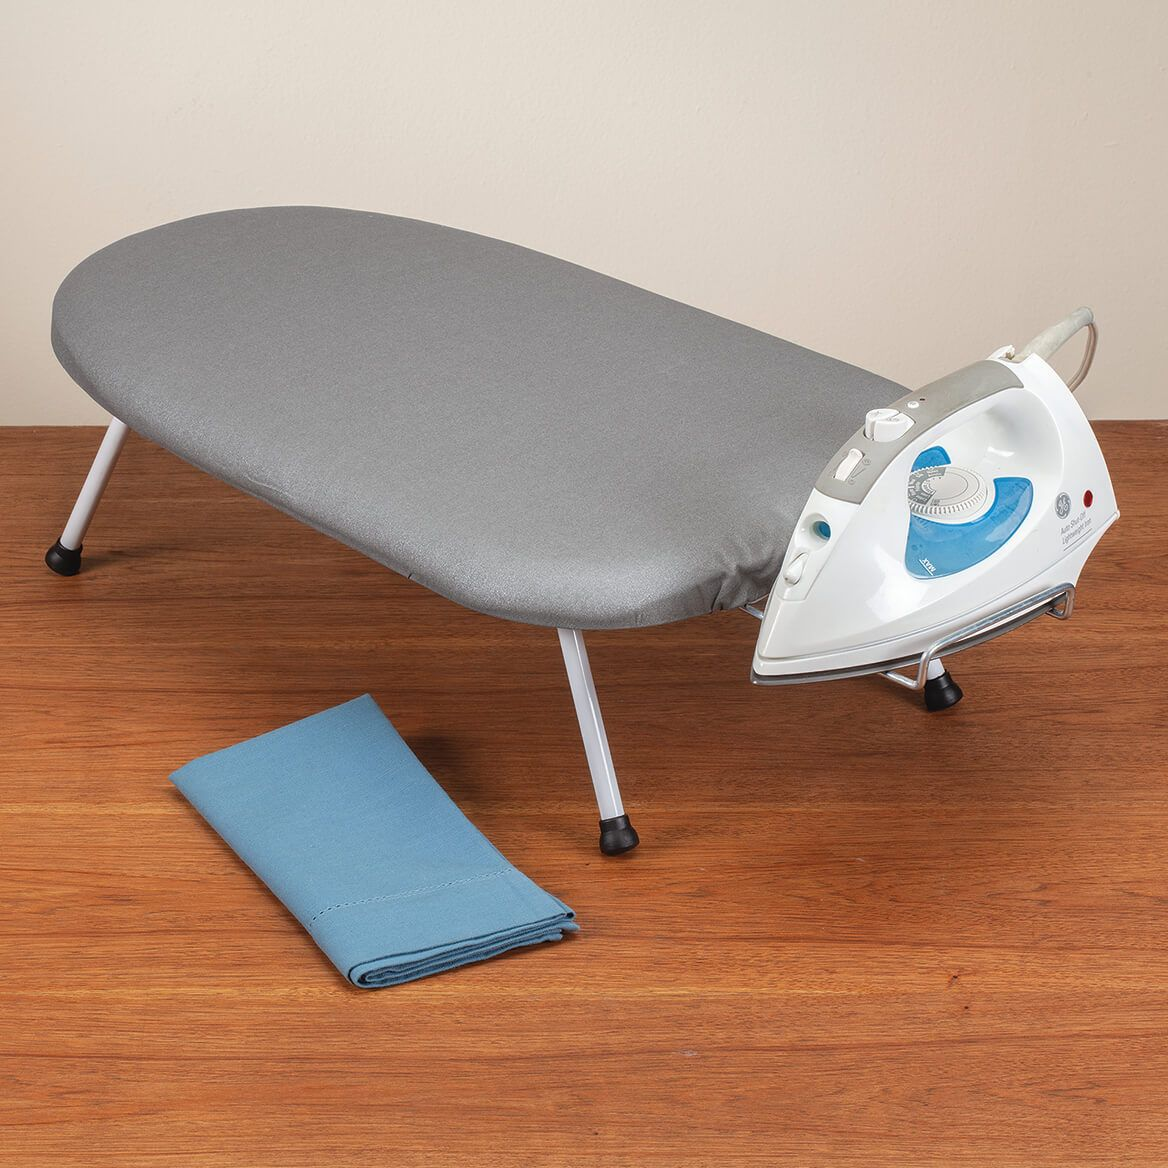 Tabletop Ironing Board                               XL-306102